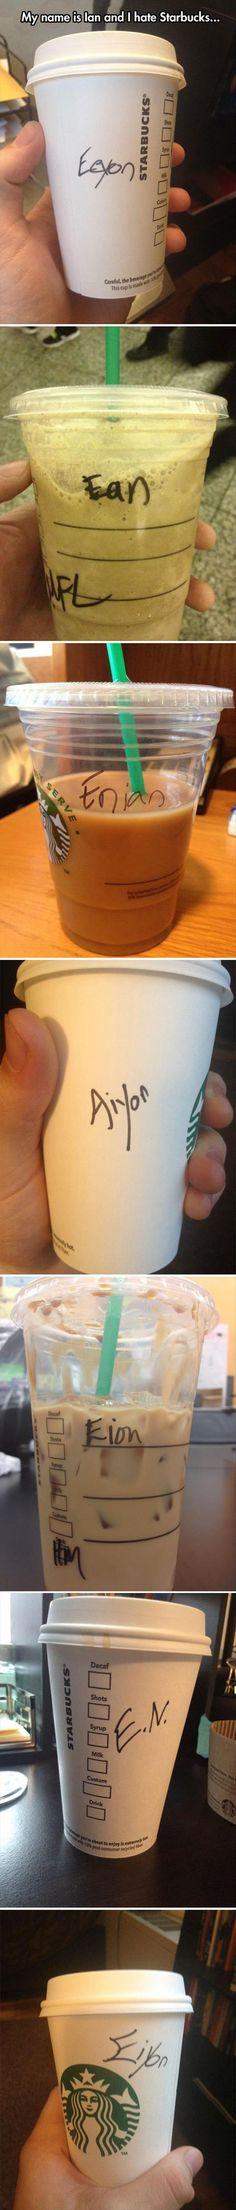 Ian Starbucks issues